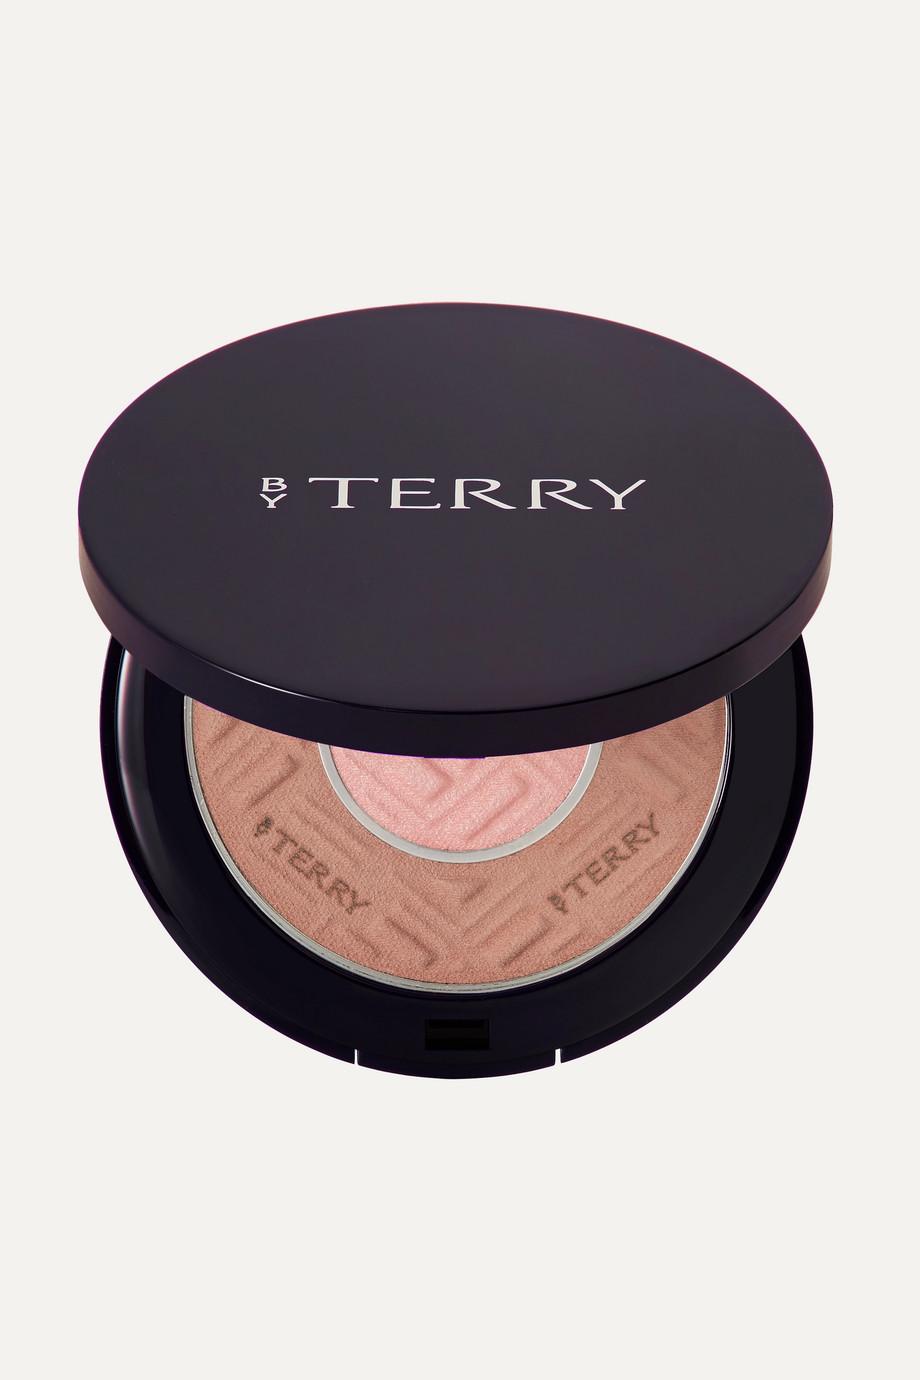 BY TERRY Voile de teint hybride Compact Expert Dual Powder, Sun Desire No.7